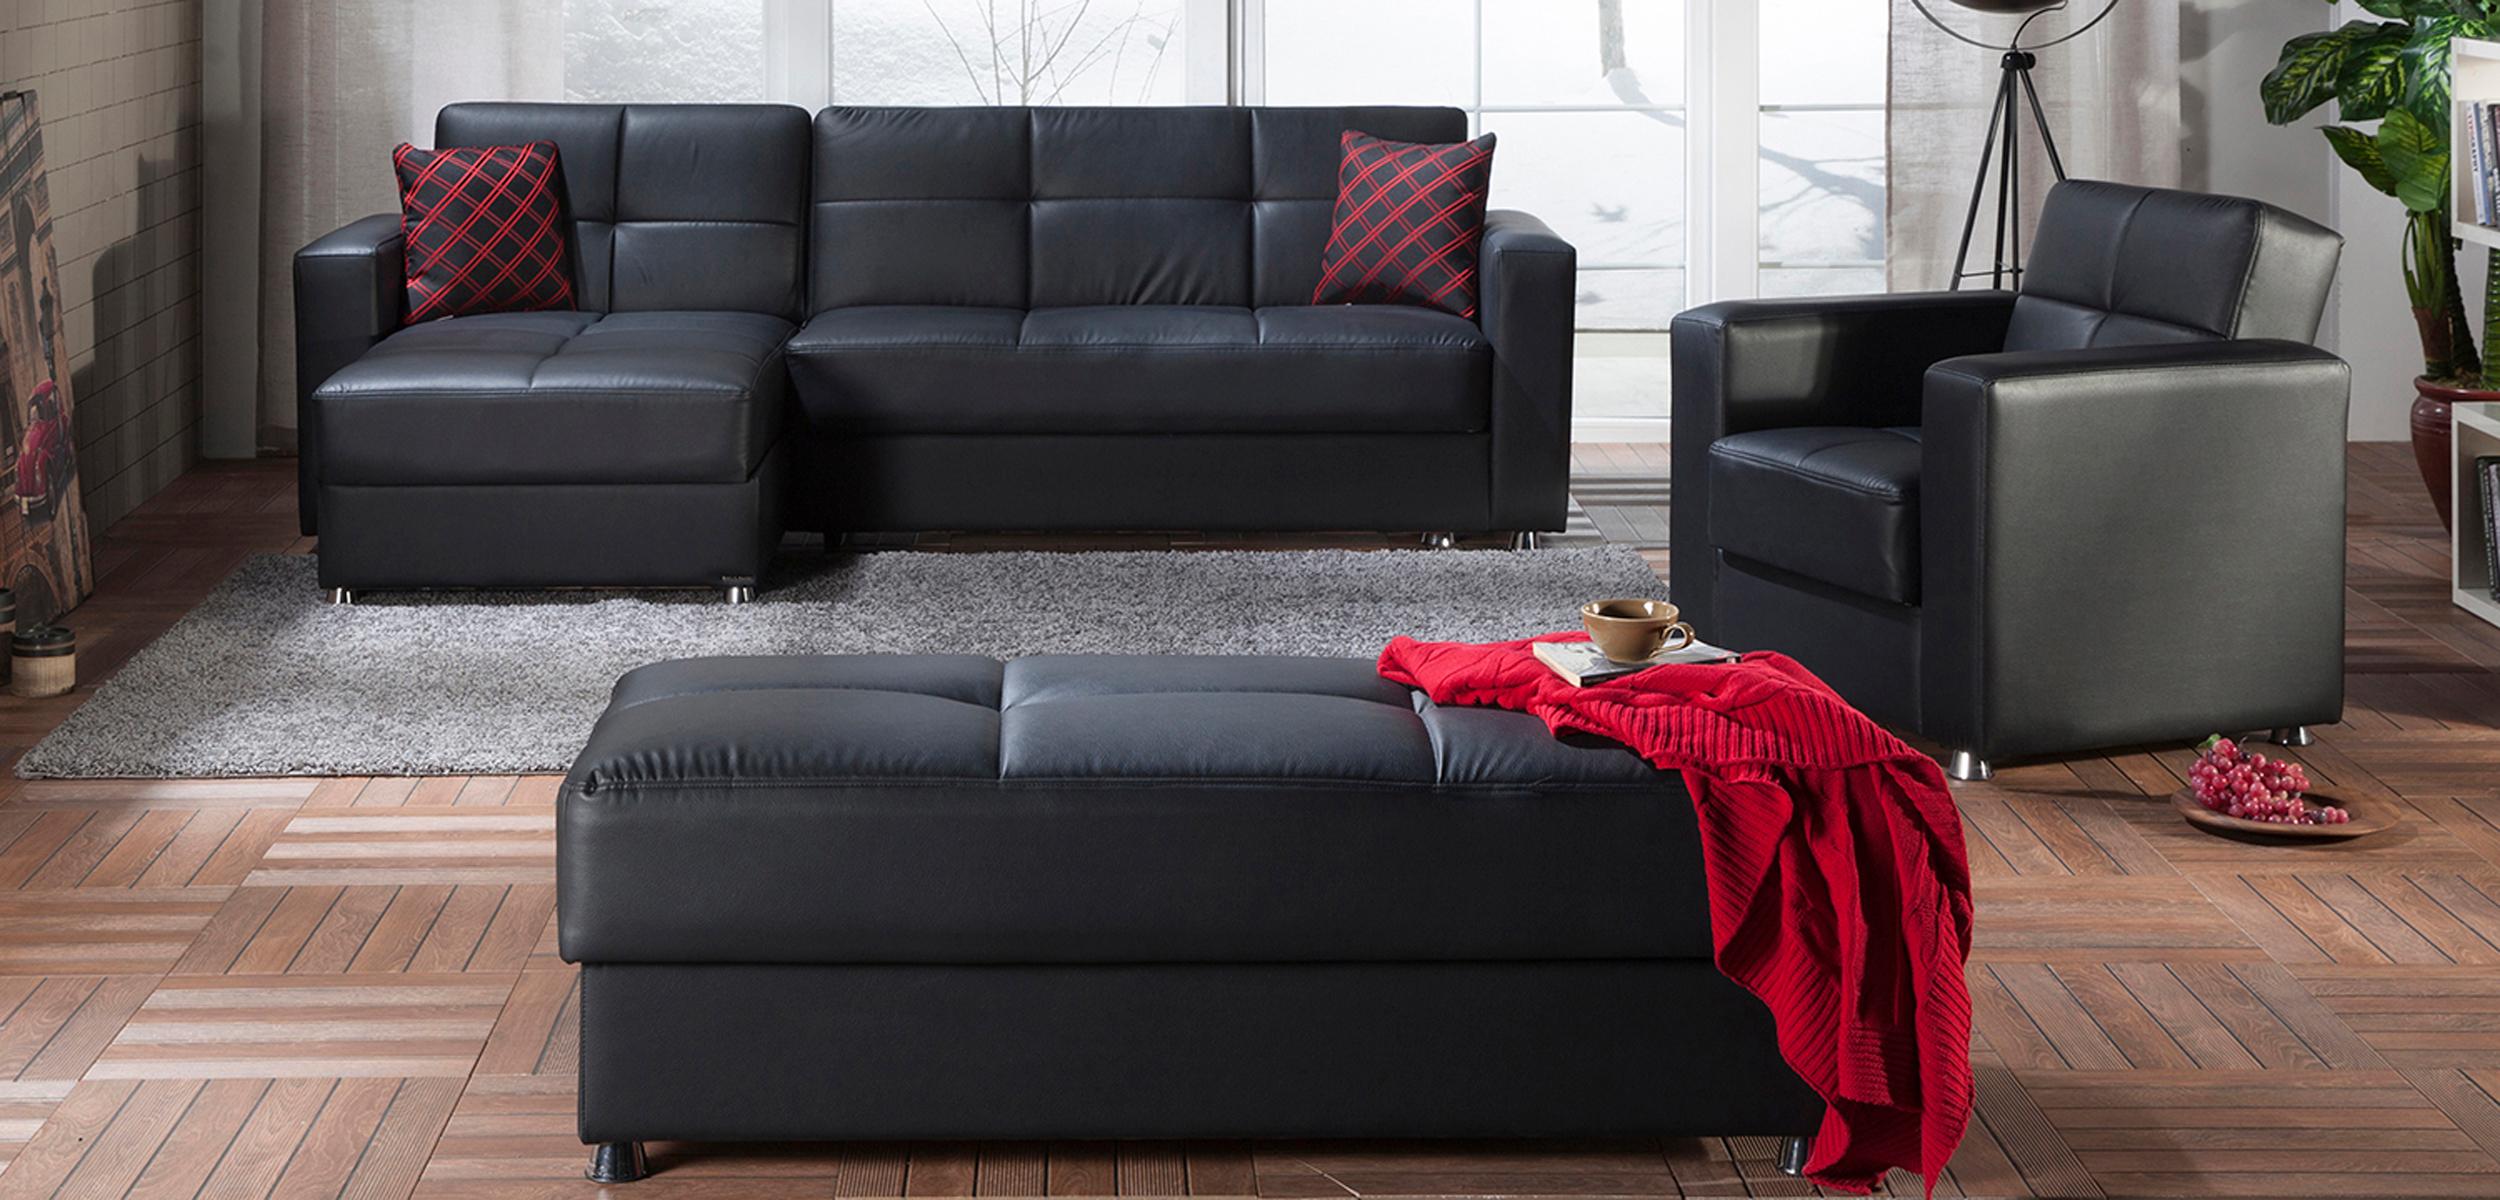 american comfort furniture mattress